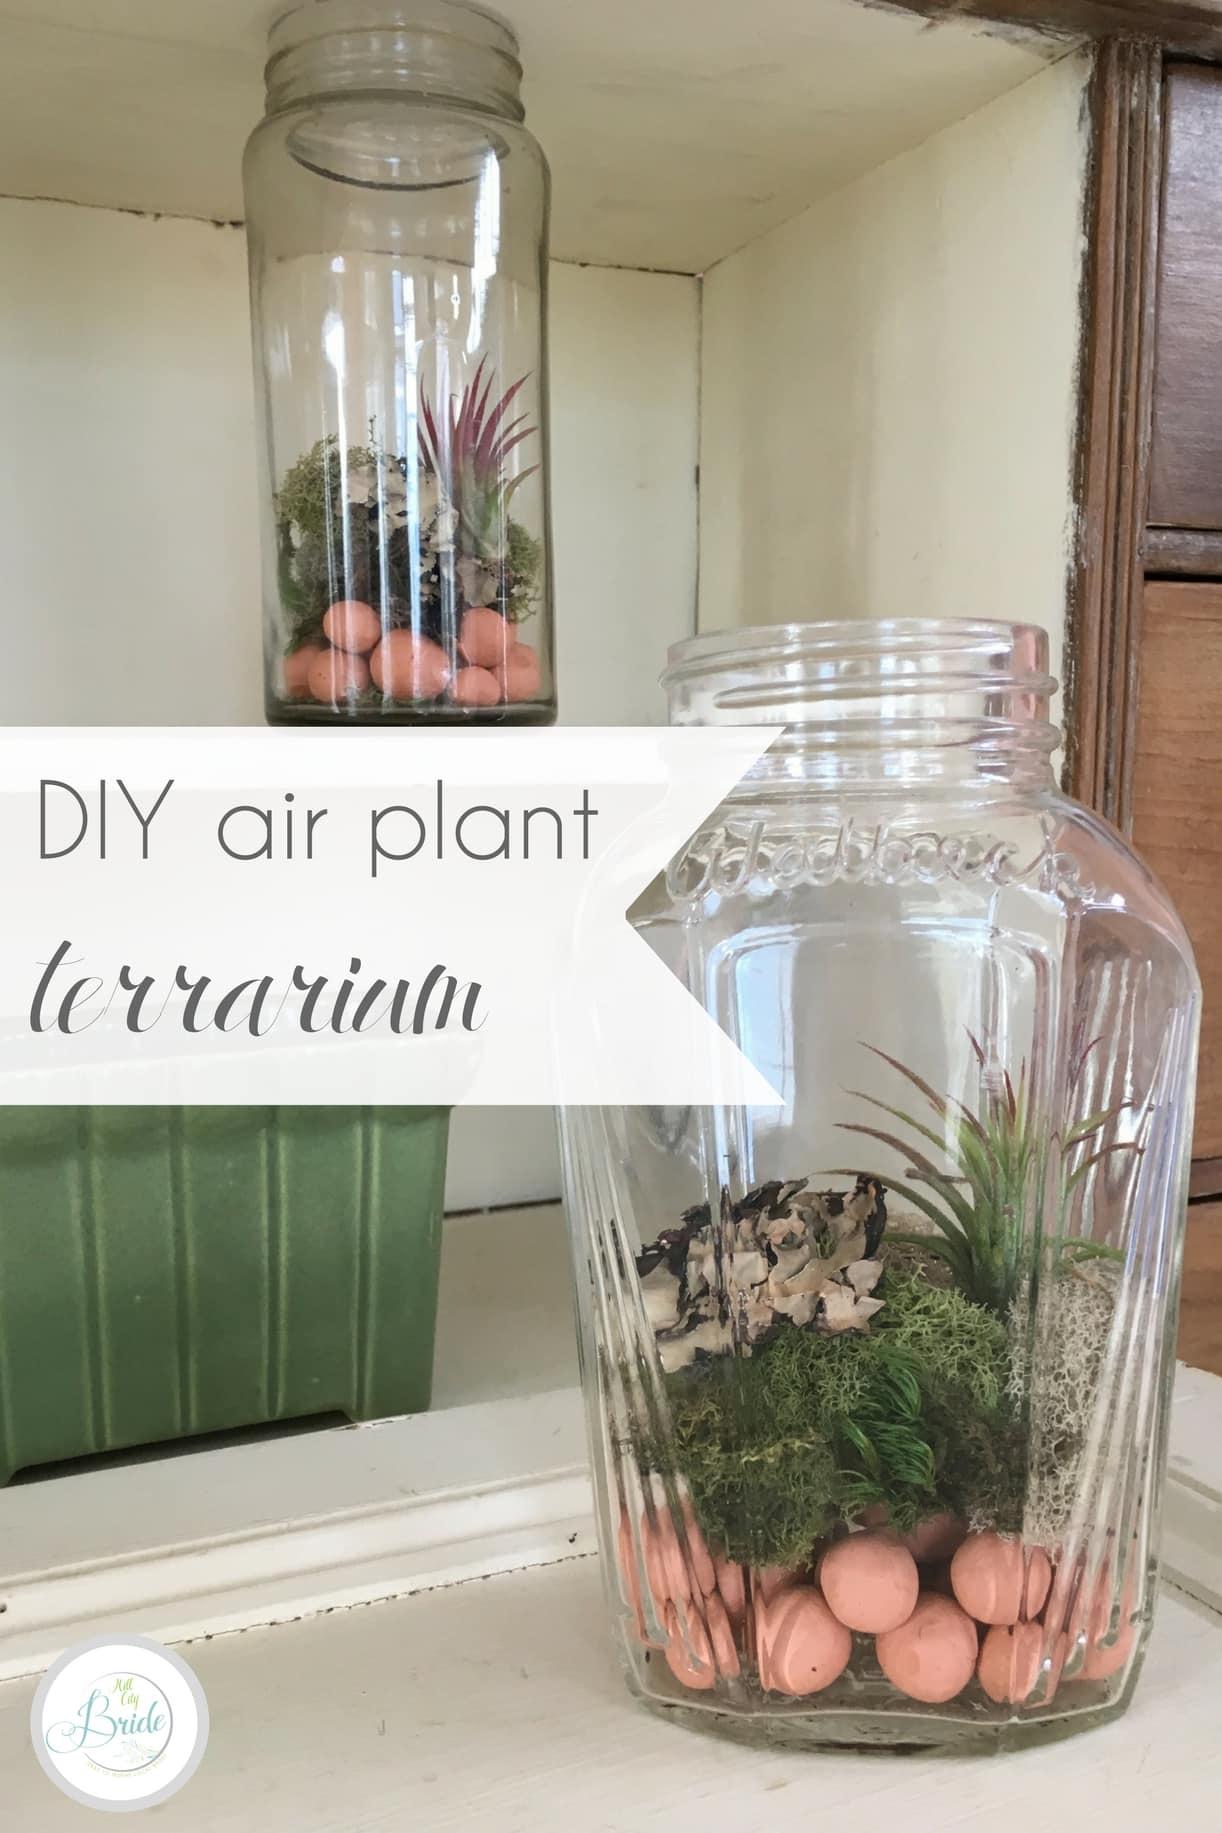 Adorable Diy Air Plant Terrarium Hill City Bride Virginia